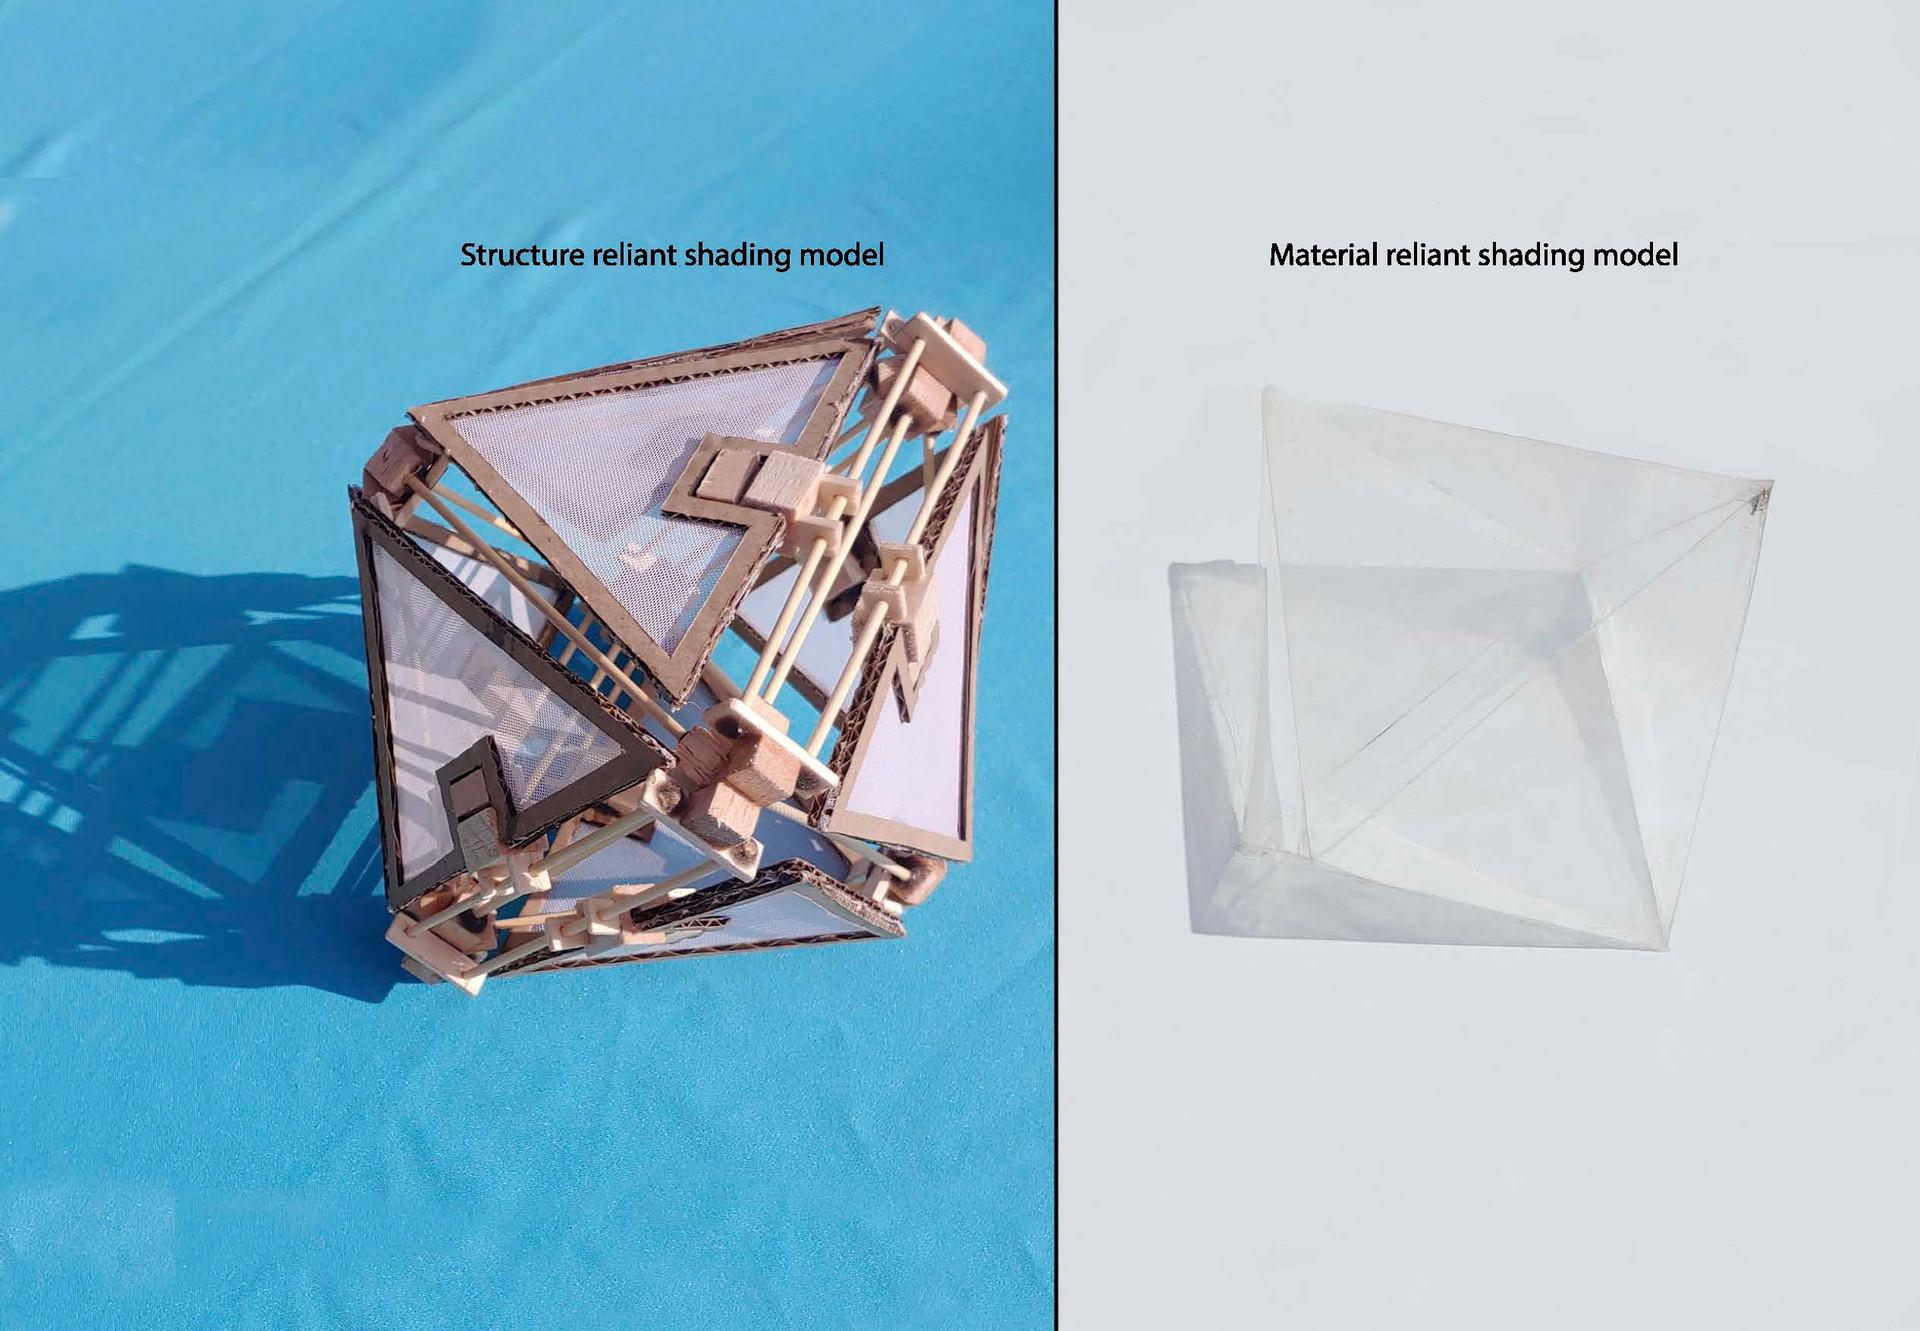 Comparative shading units: fabric vs translucent material. Potgieter, R. Unit 17. 2020.